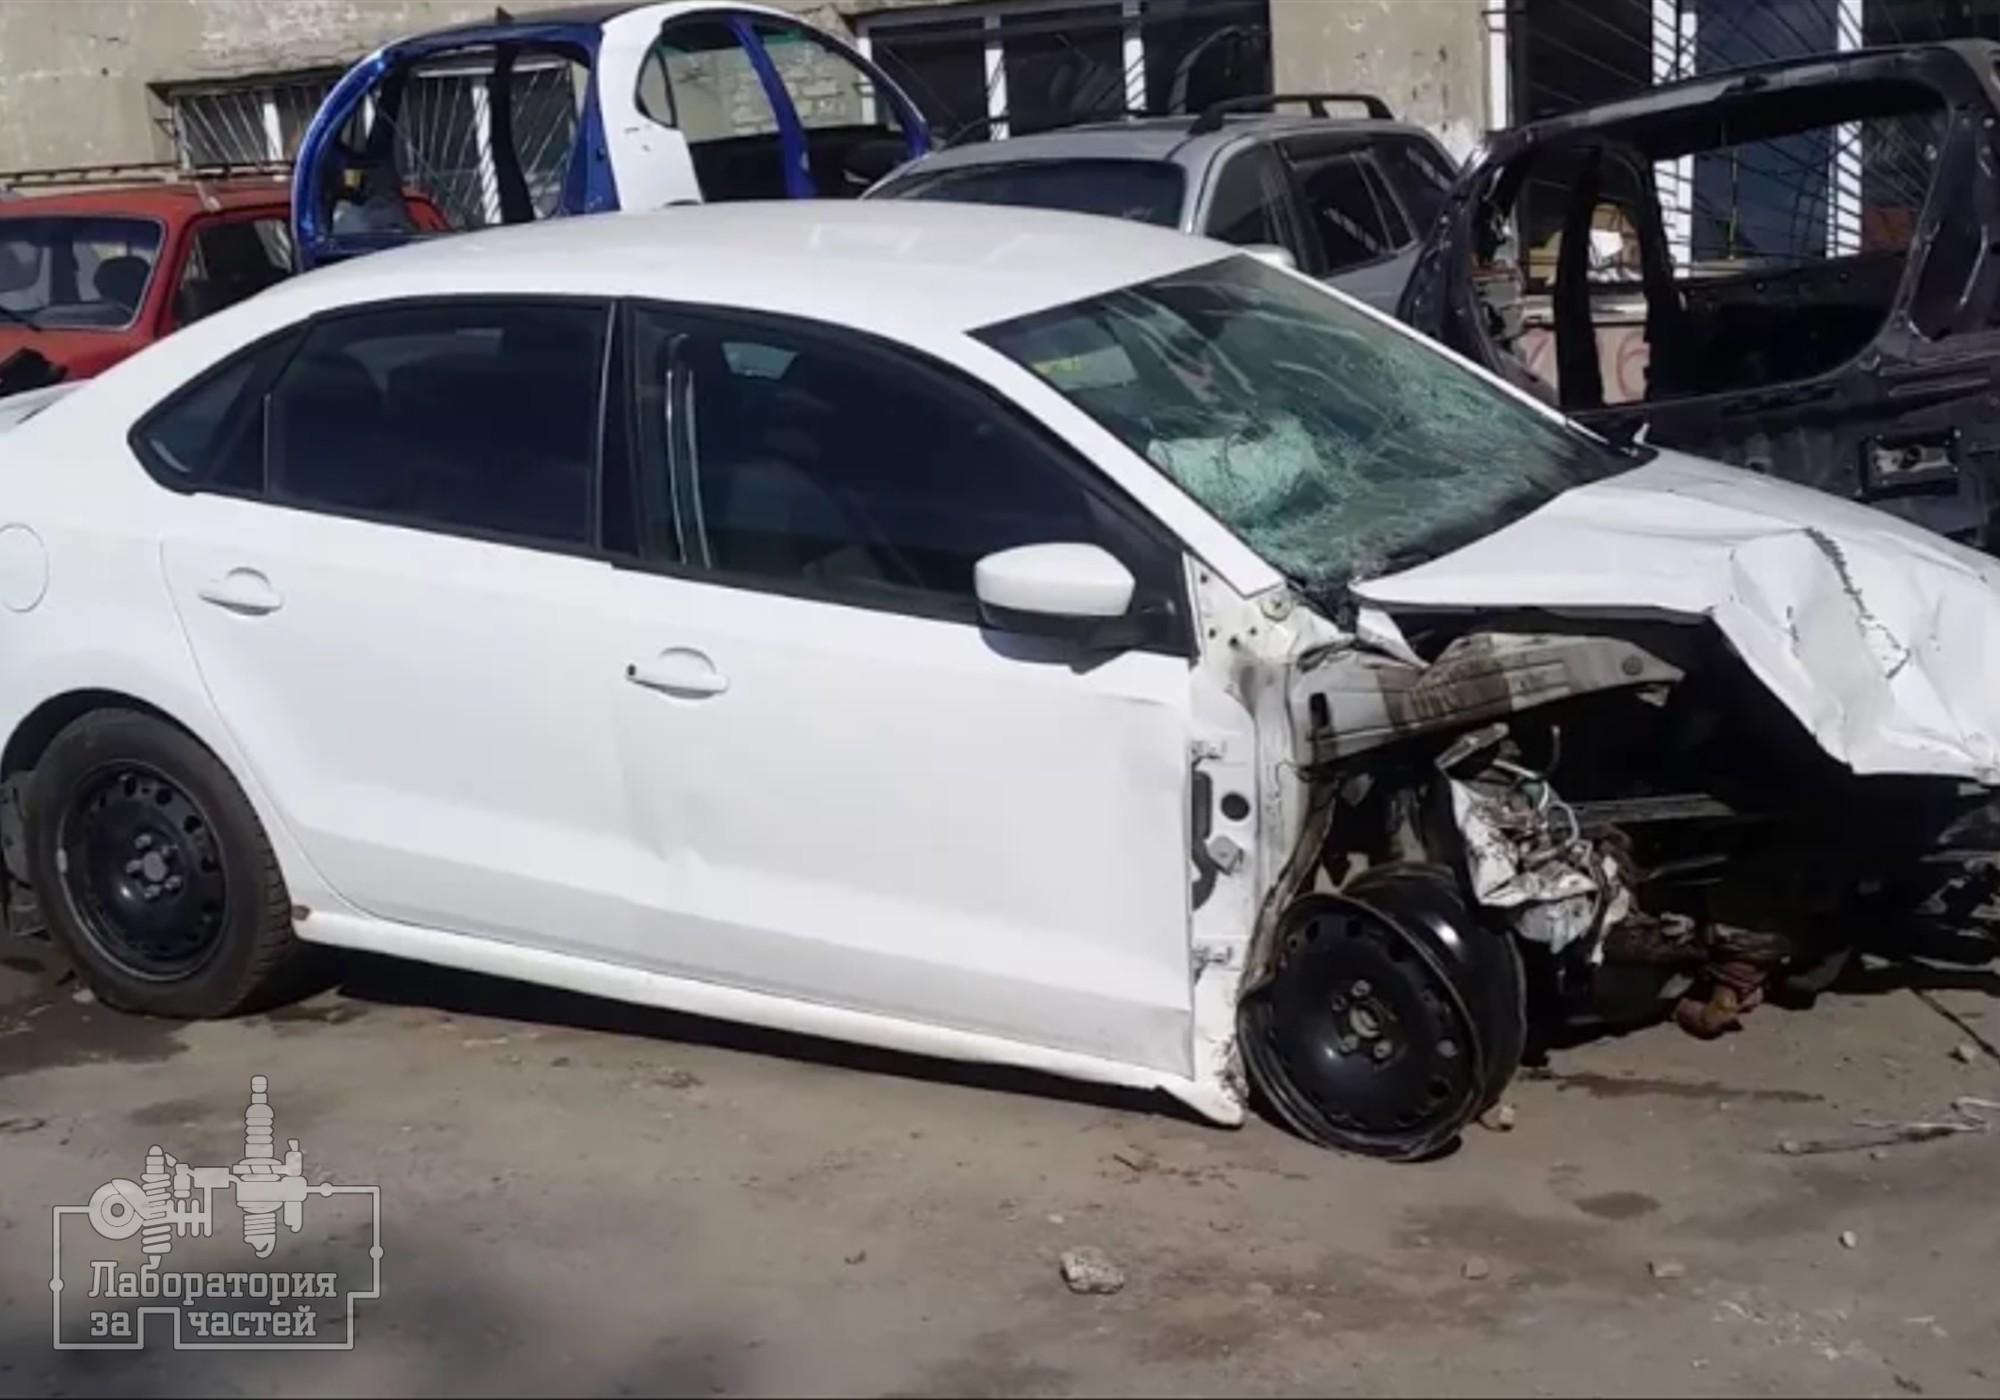 Volkswagen Polo V 2013 г. в разборе